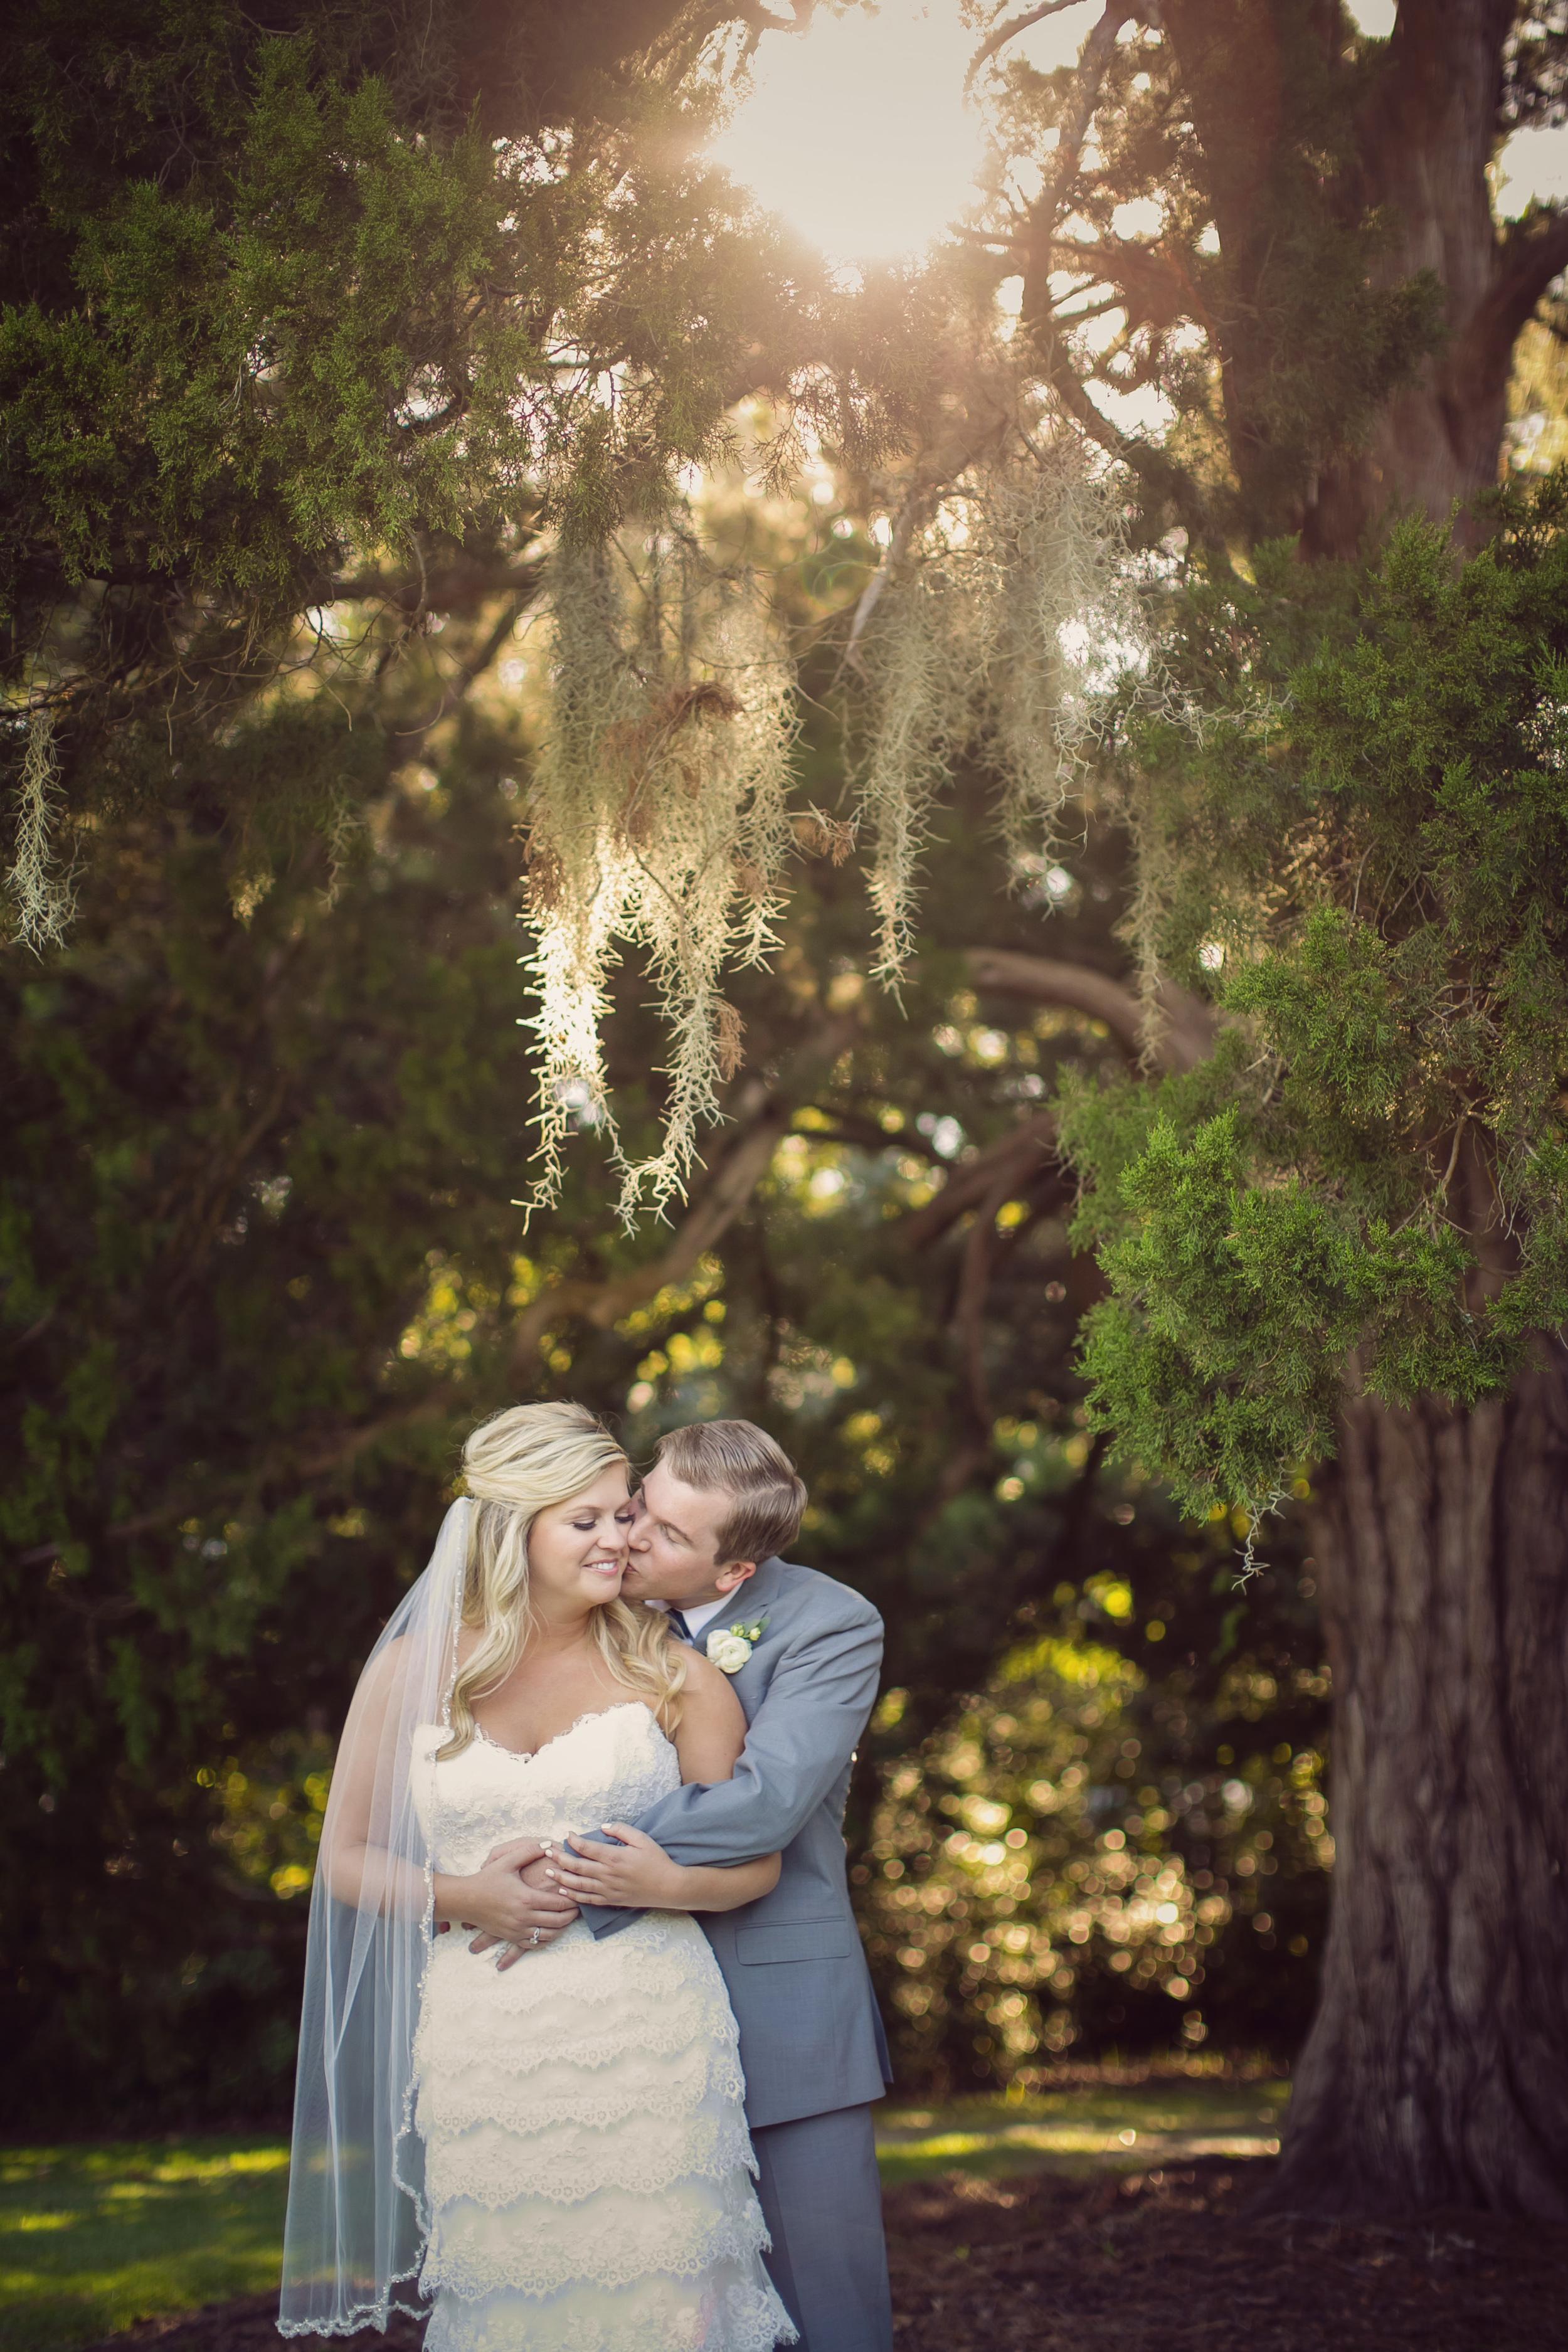 Hannah + Andy's Charleston wedding at The Island House